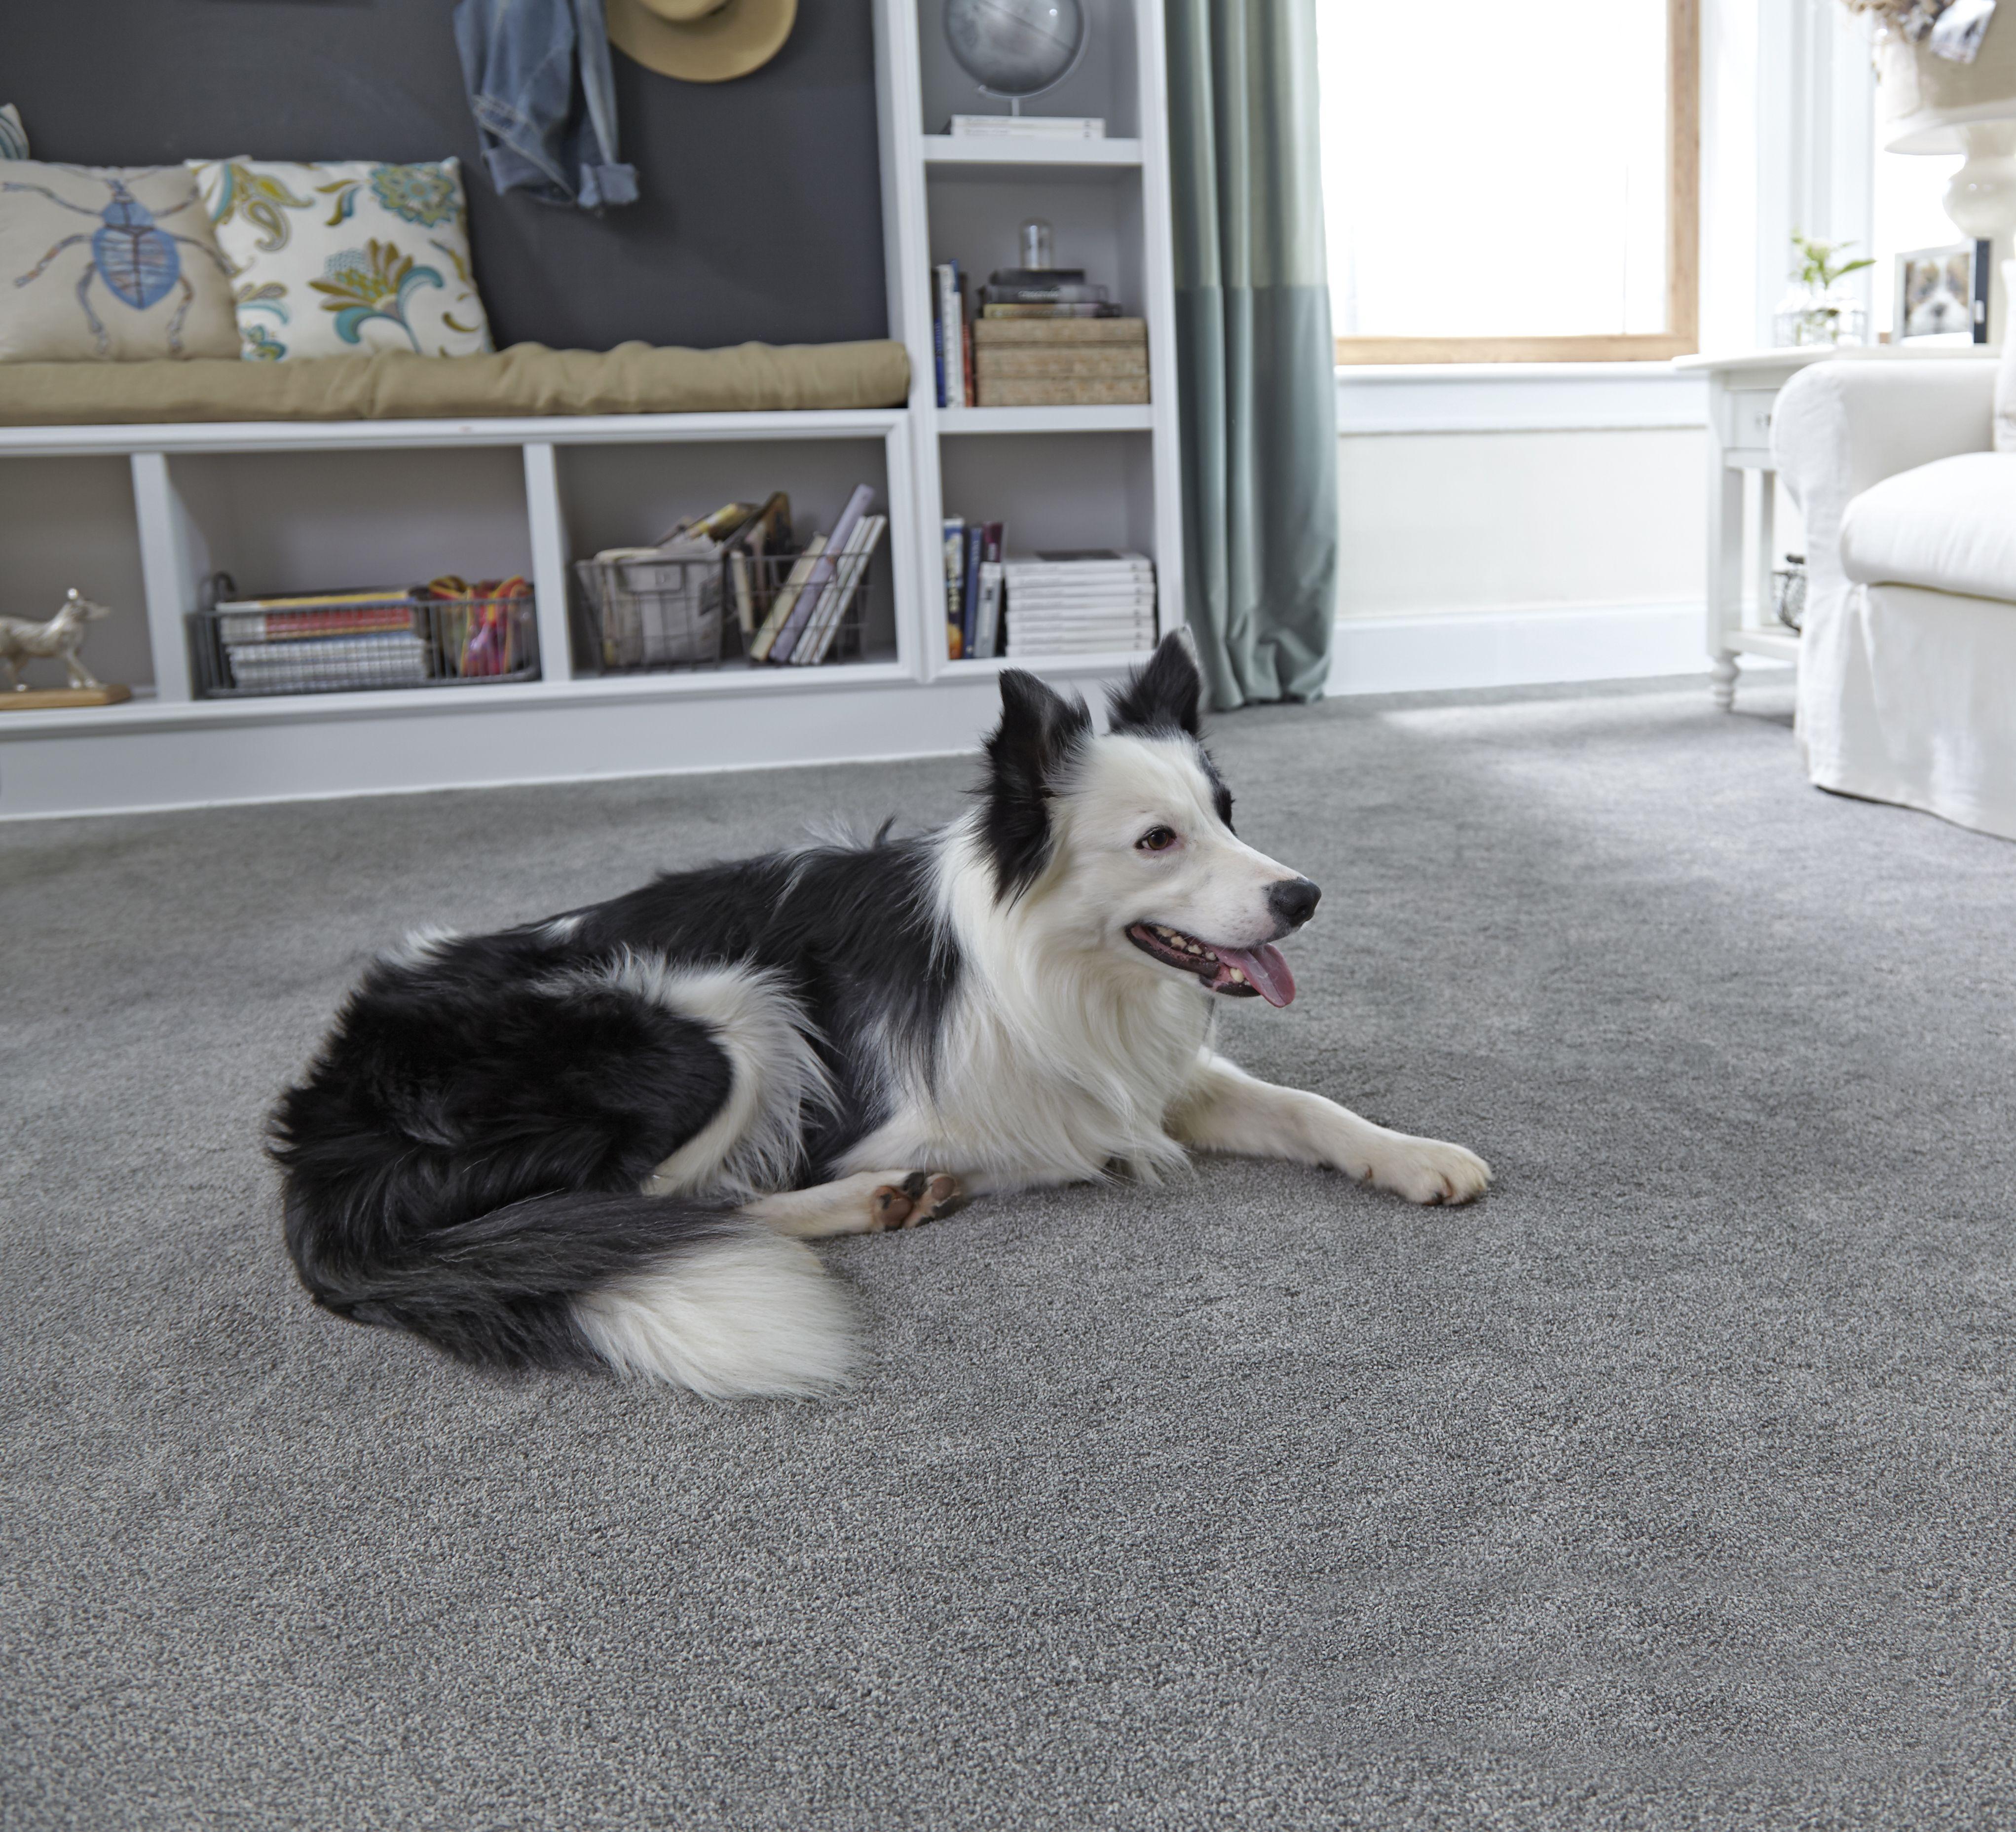 San Diego Carpets, Hardwood Flooring And More